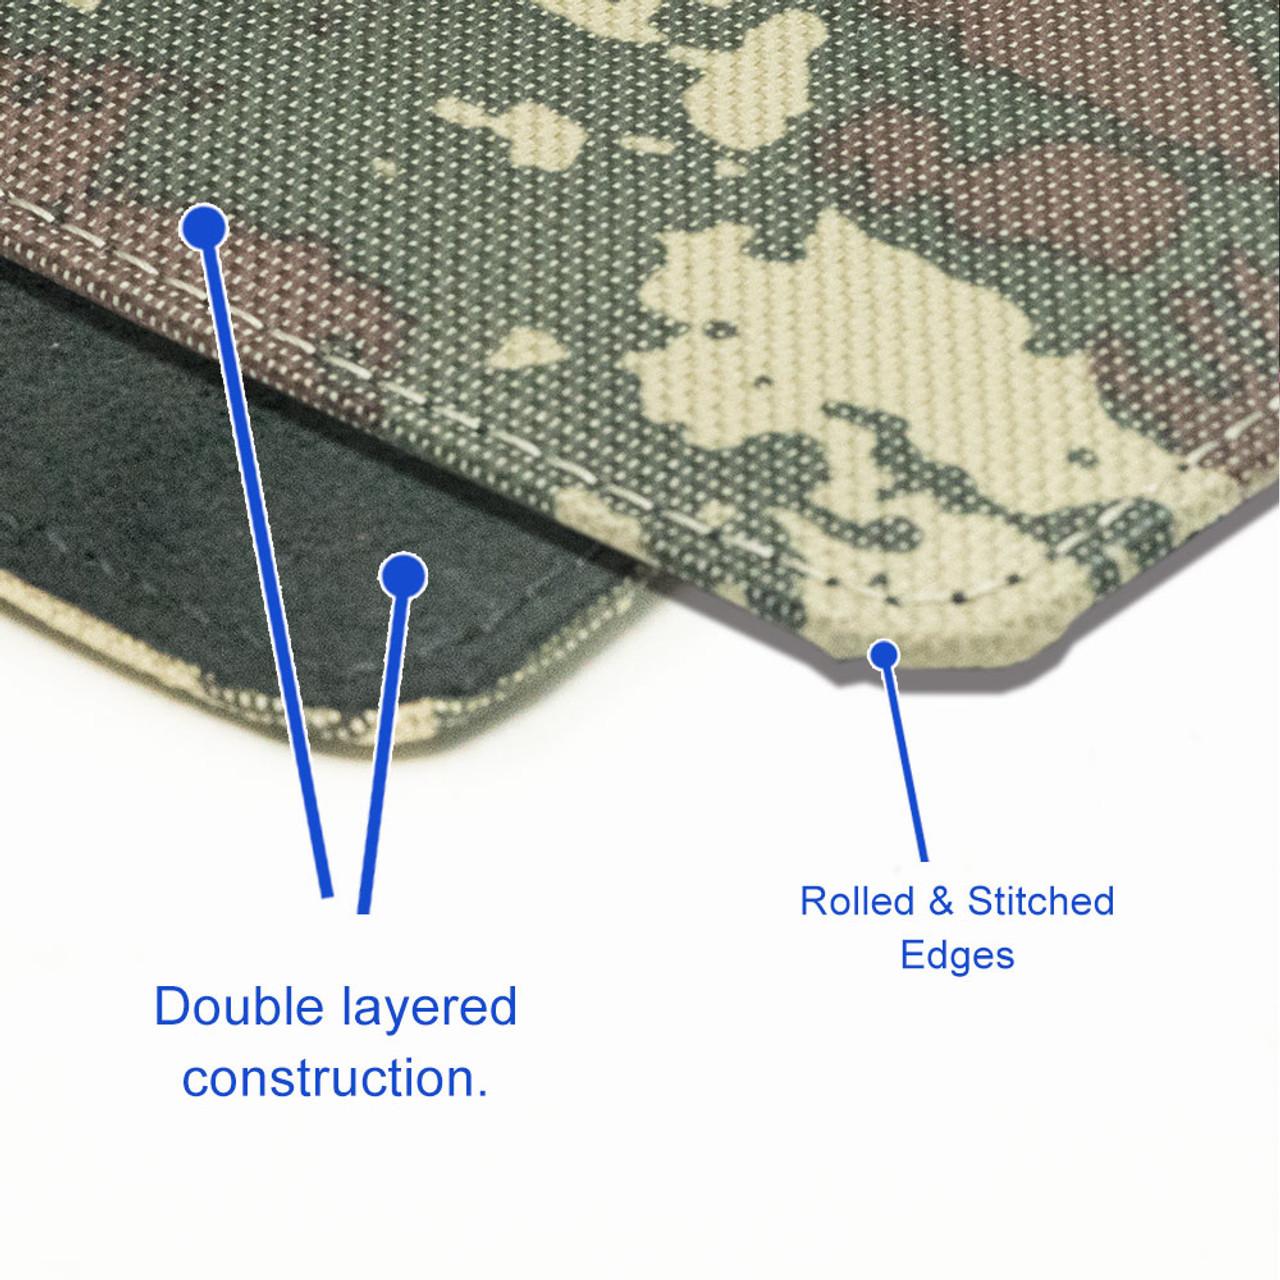 Glock 43X Camouflage Nylon Series Holster